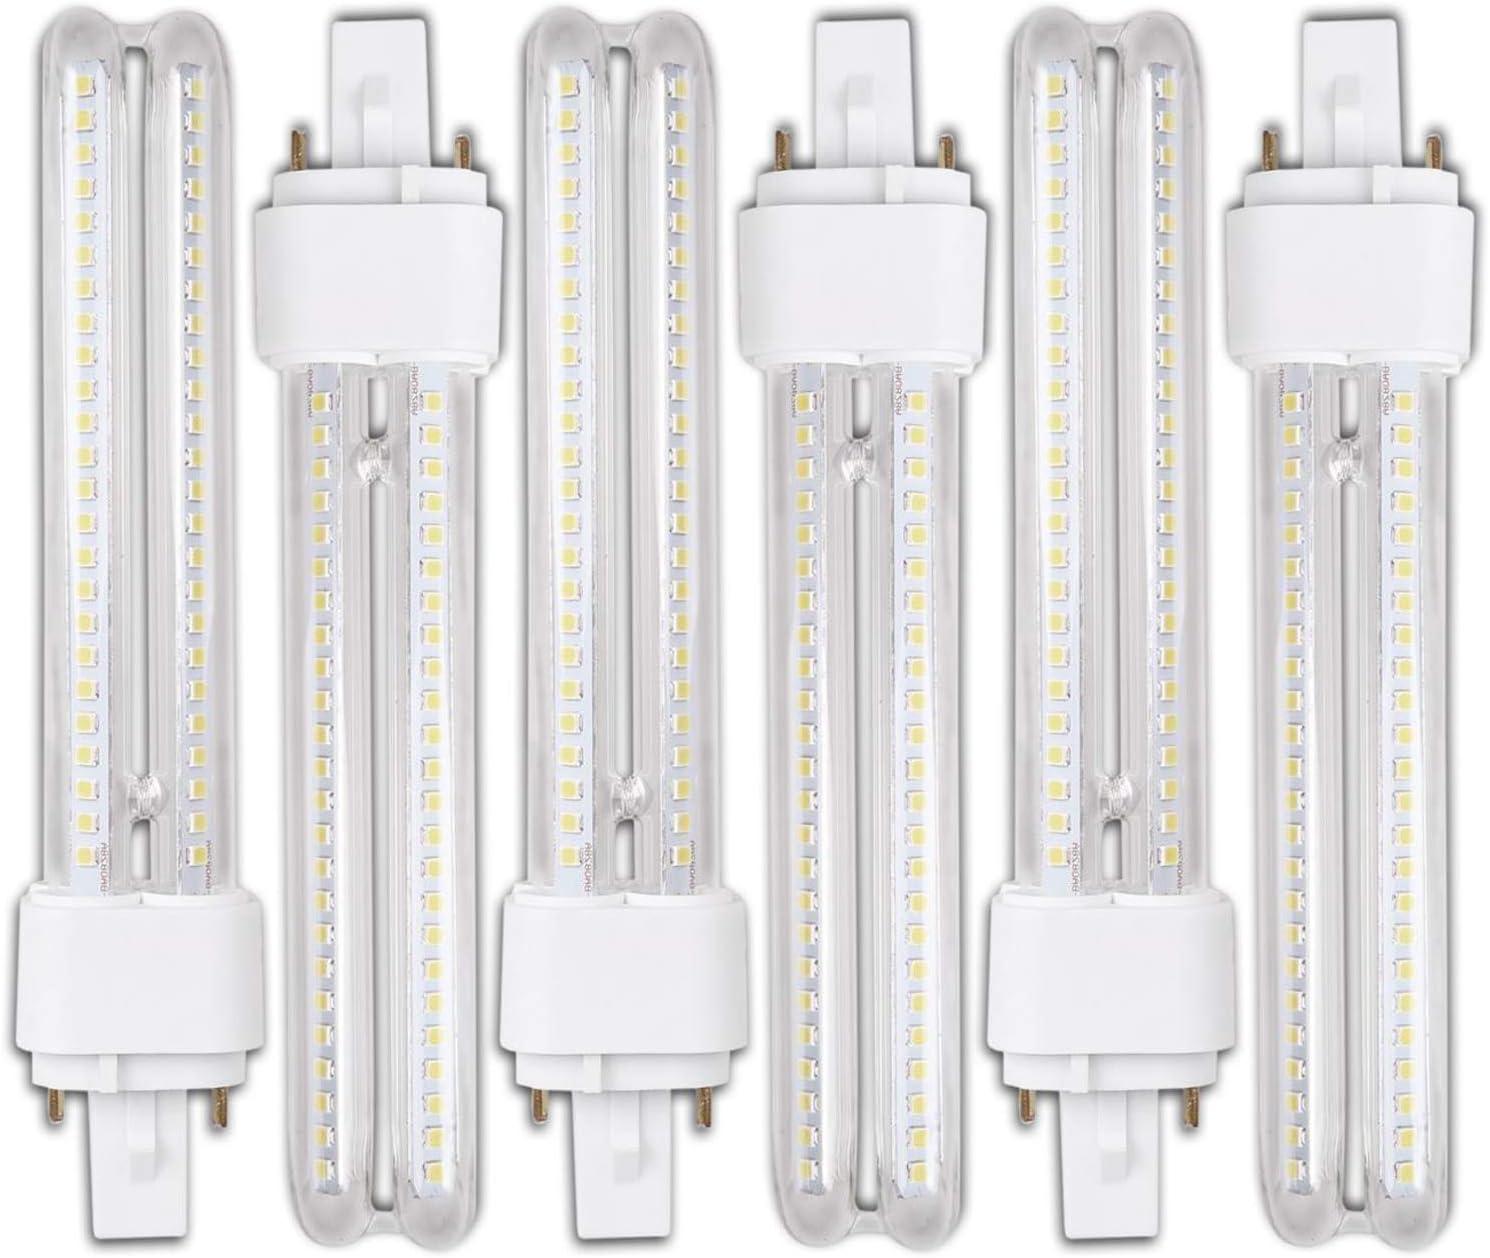 Genetic H268 15W- Pack 6 Bombillas PLC LED 15W Luz Fria A+ G24 2Pin H268: Amazon.es: Iluminación